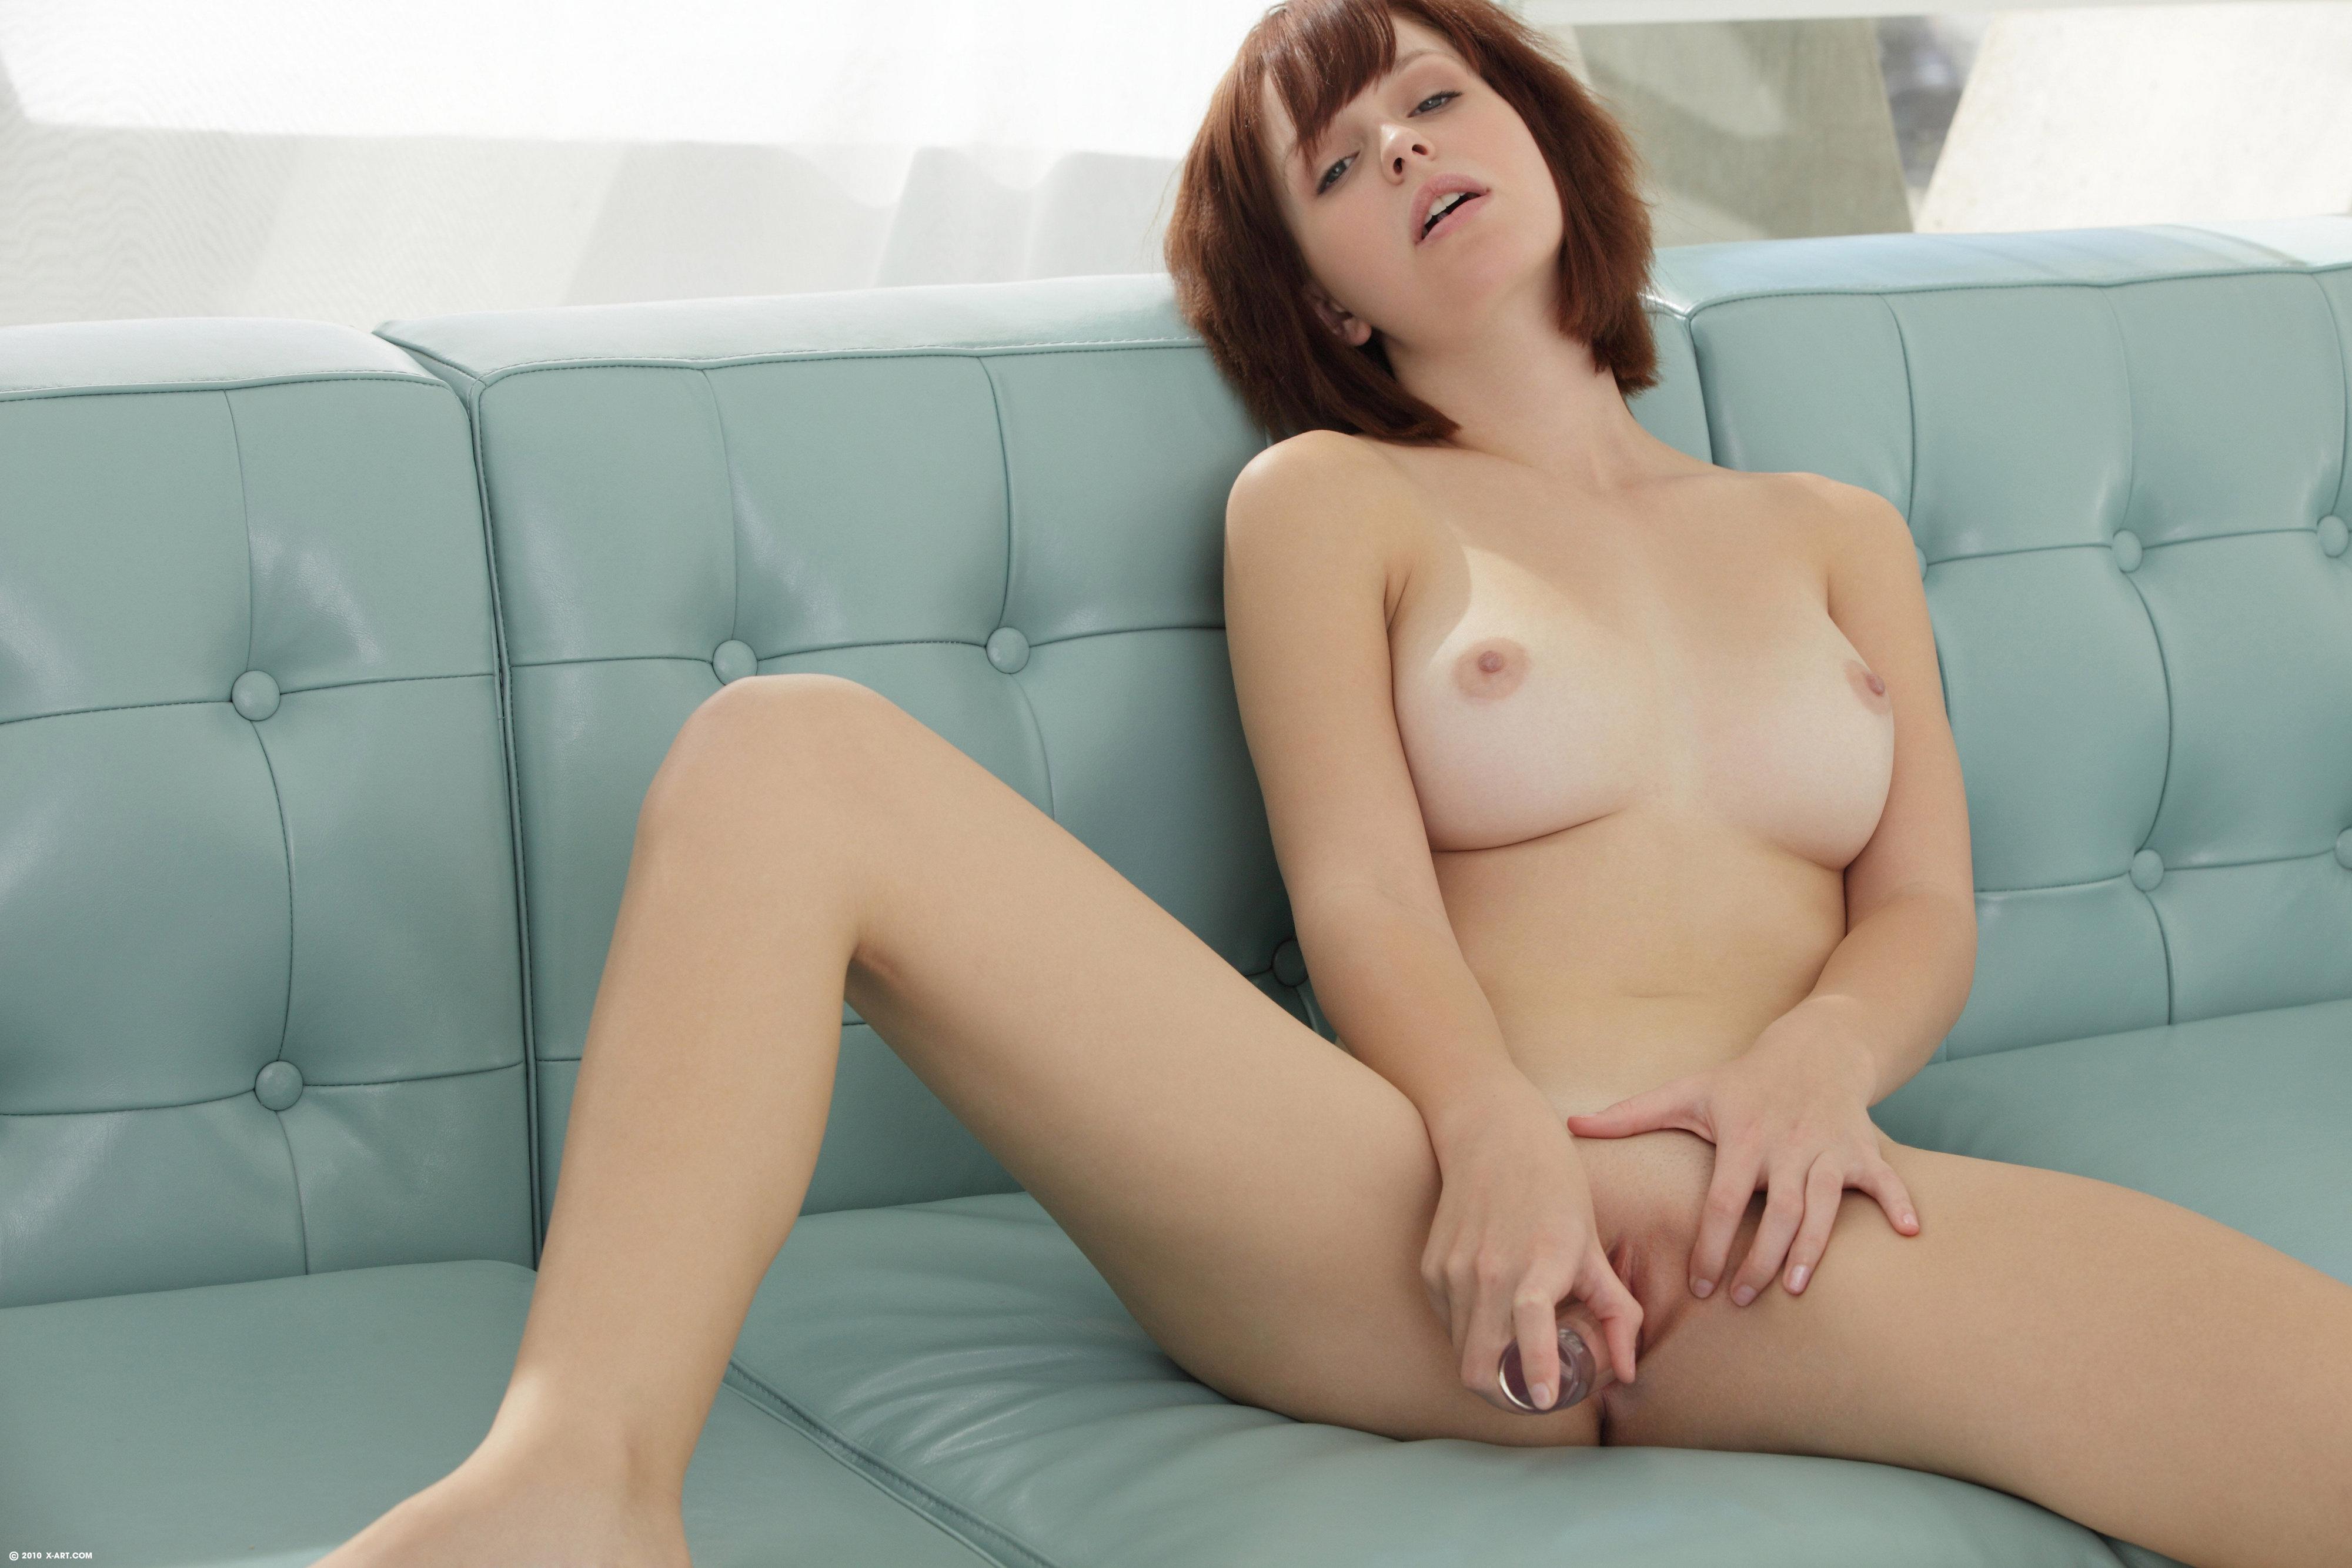 hayden panierte nude pussy